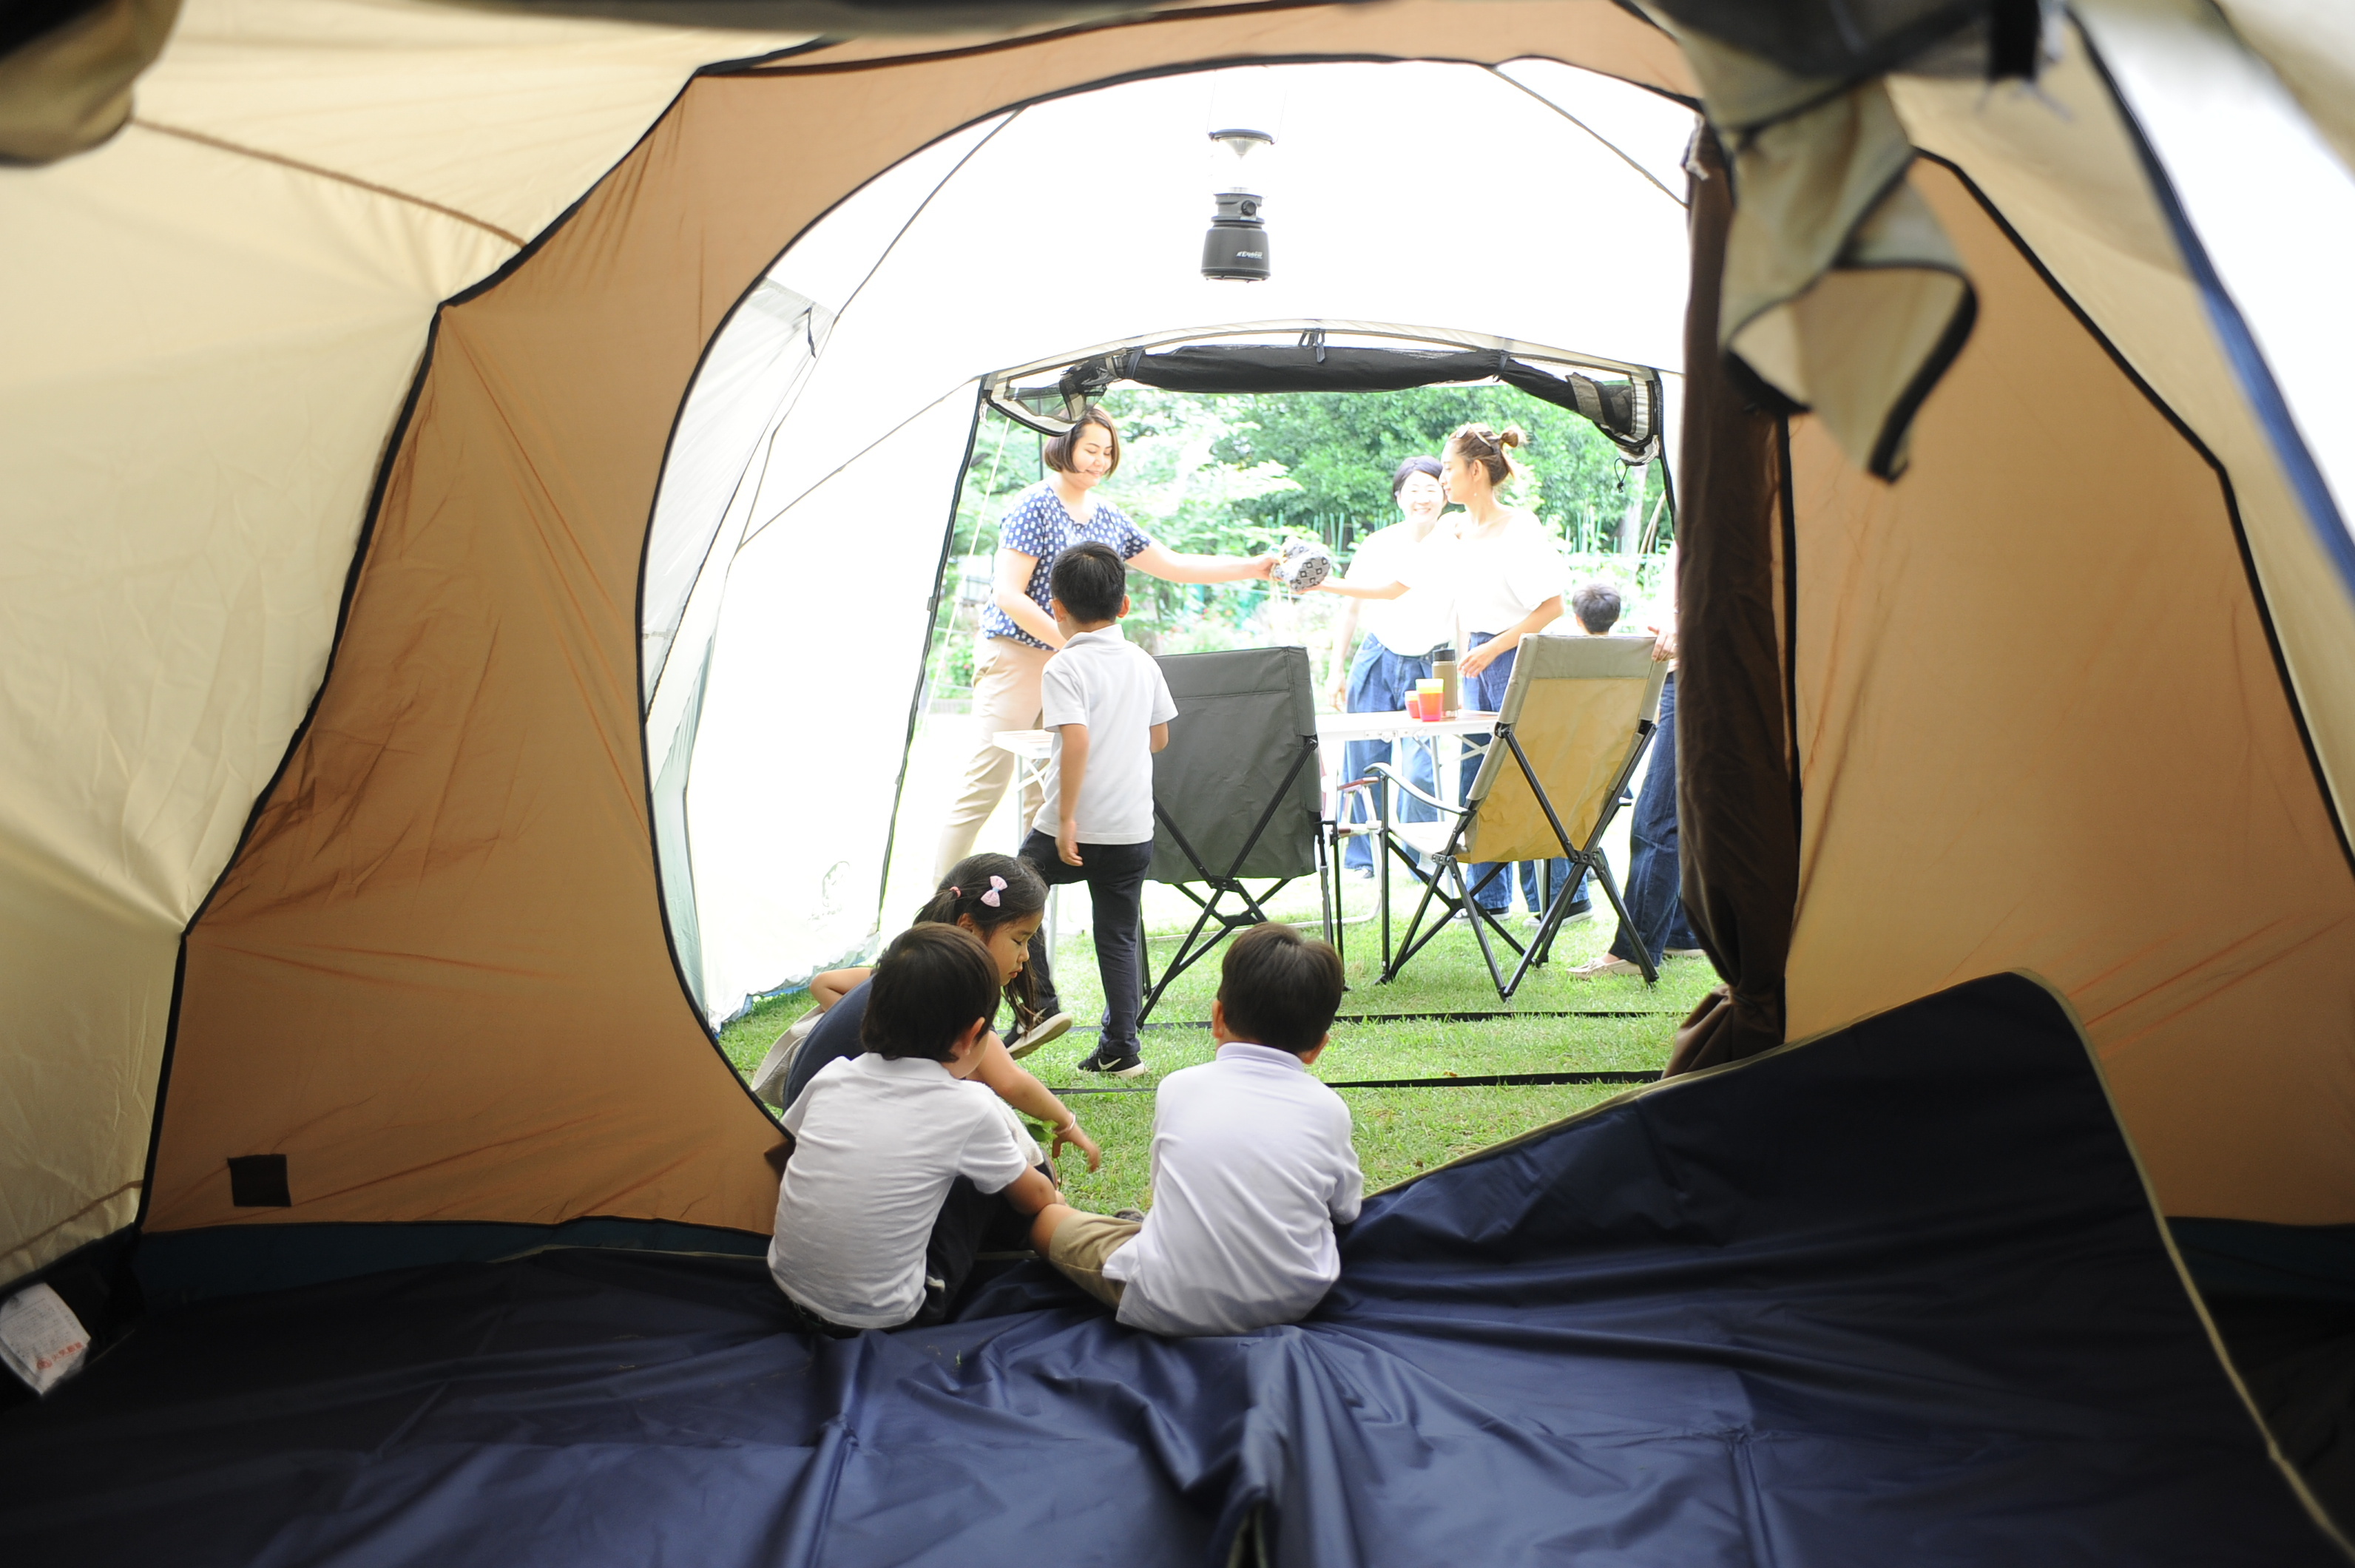 Whole Earth(ホールアース)ではじめる家族キャンプ